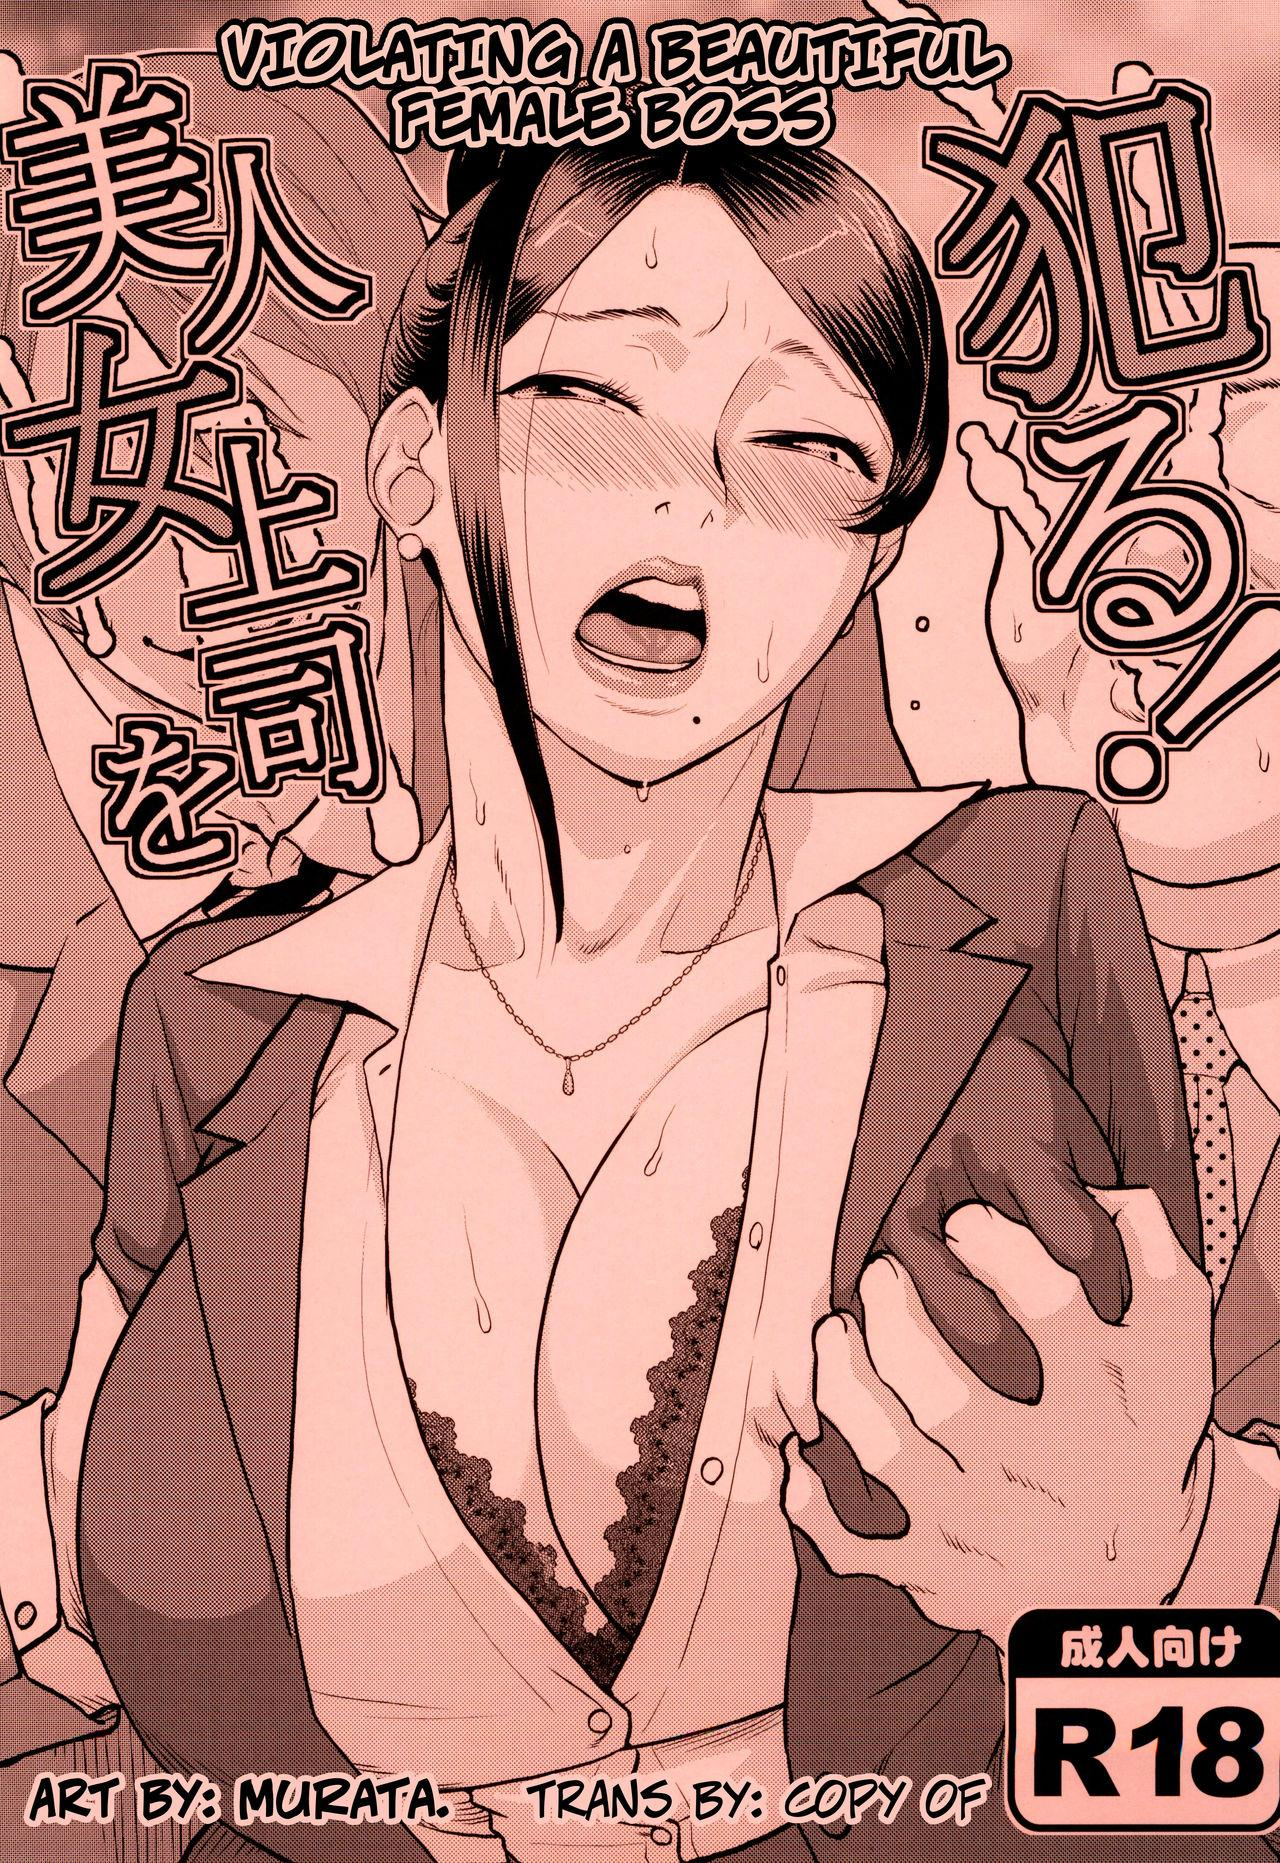 Bijin Onna Joushi o Yaru!   Violating A Beautiful Female Boss 1 0